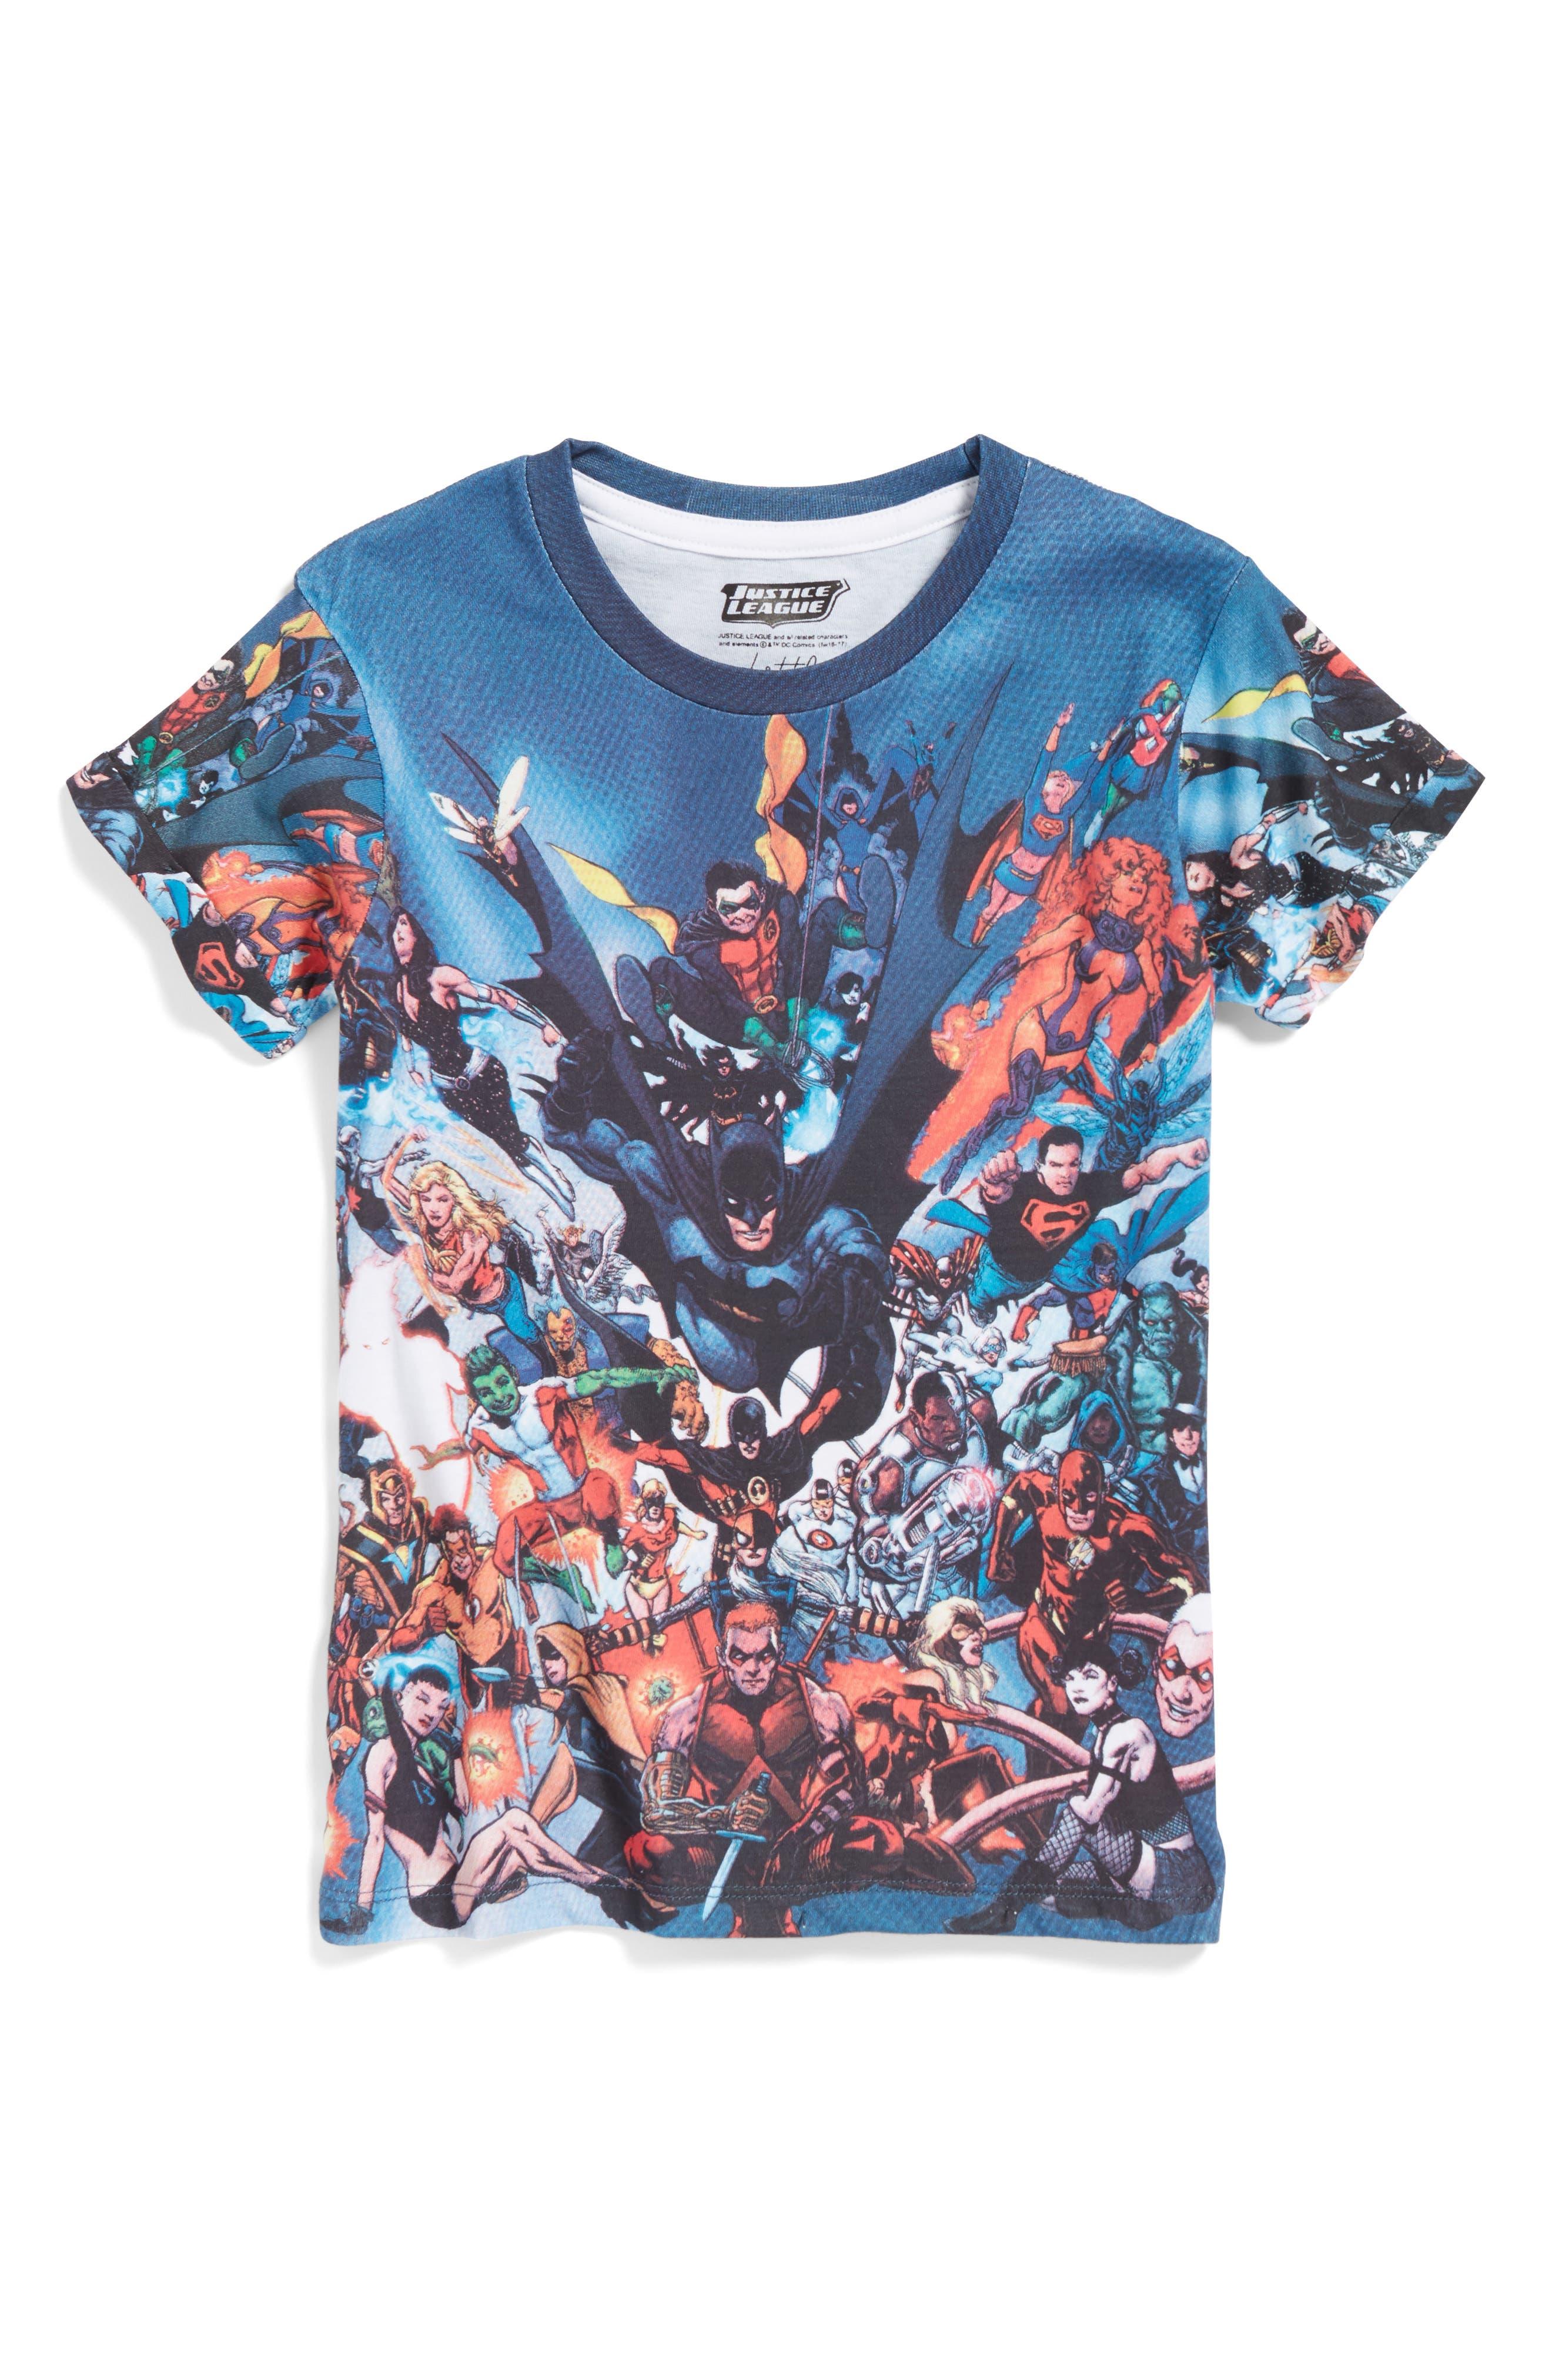 Justice League Superhero T-Shirt,                             Main thumbnail 1, color,                             020